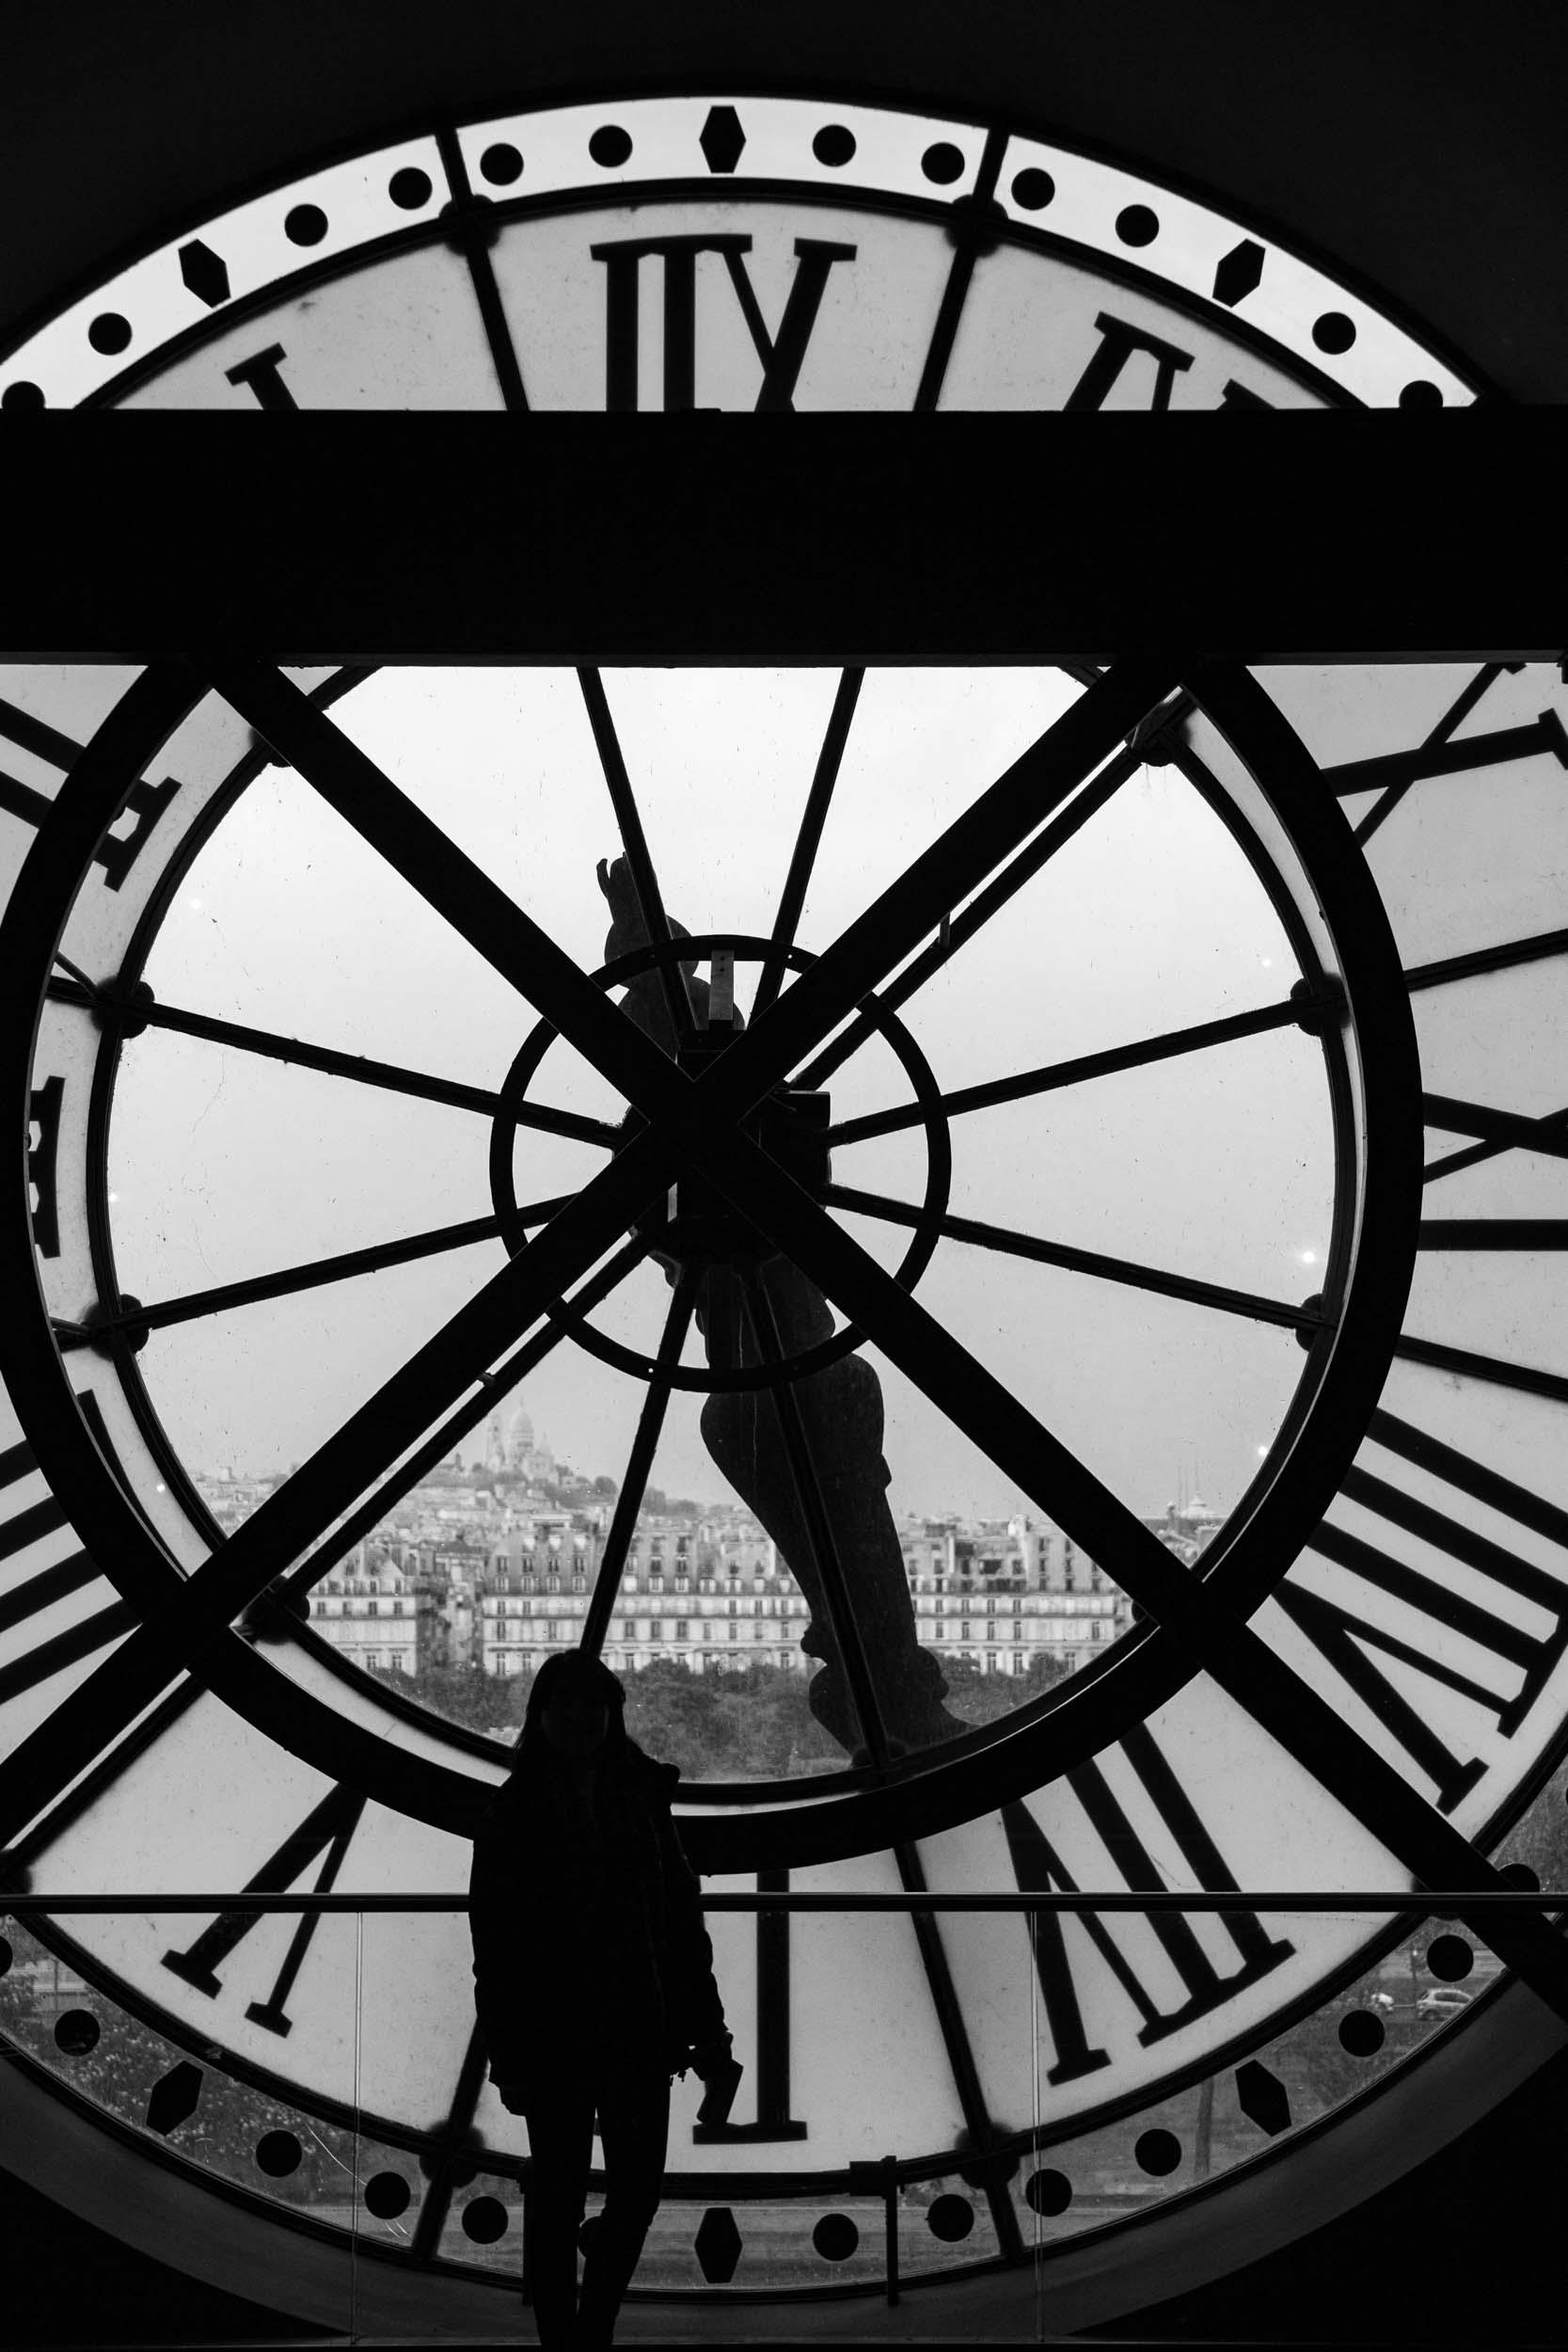 Musee D'Orsay Paris, France 2017